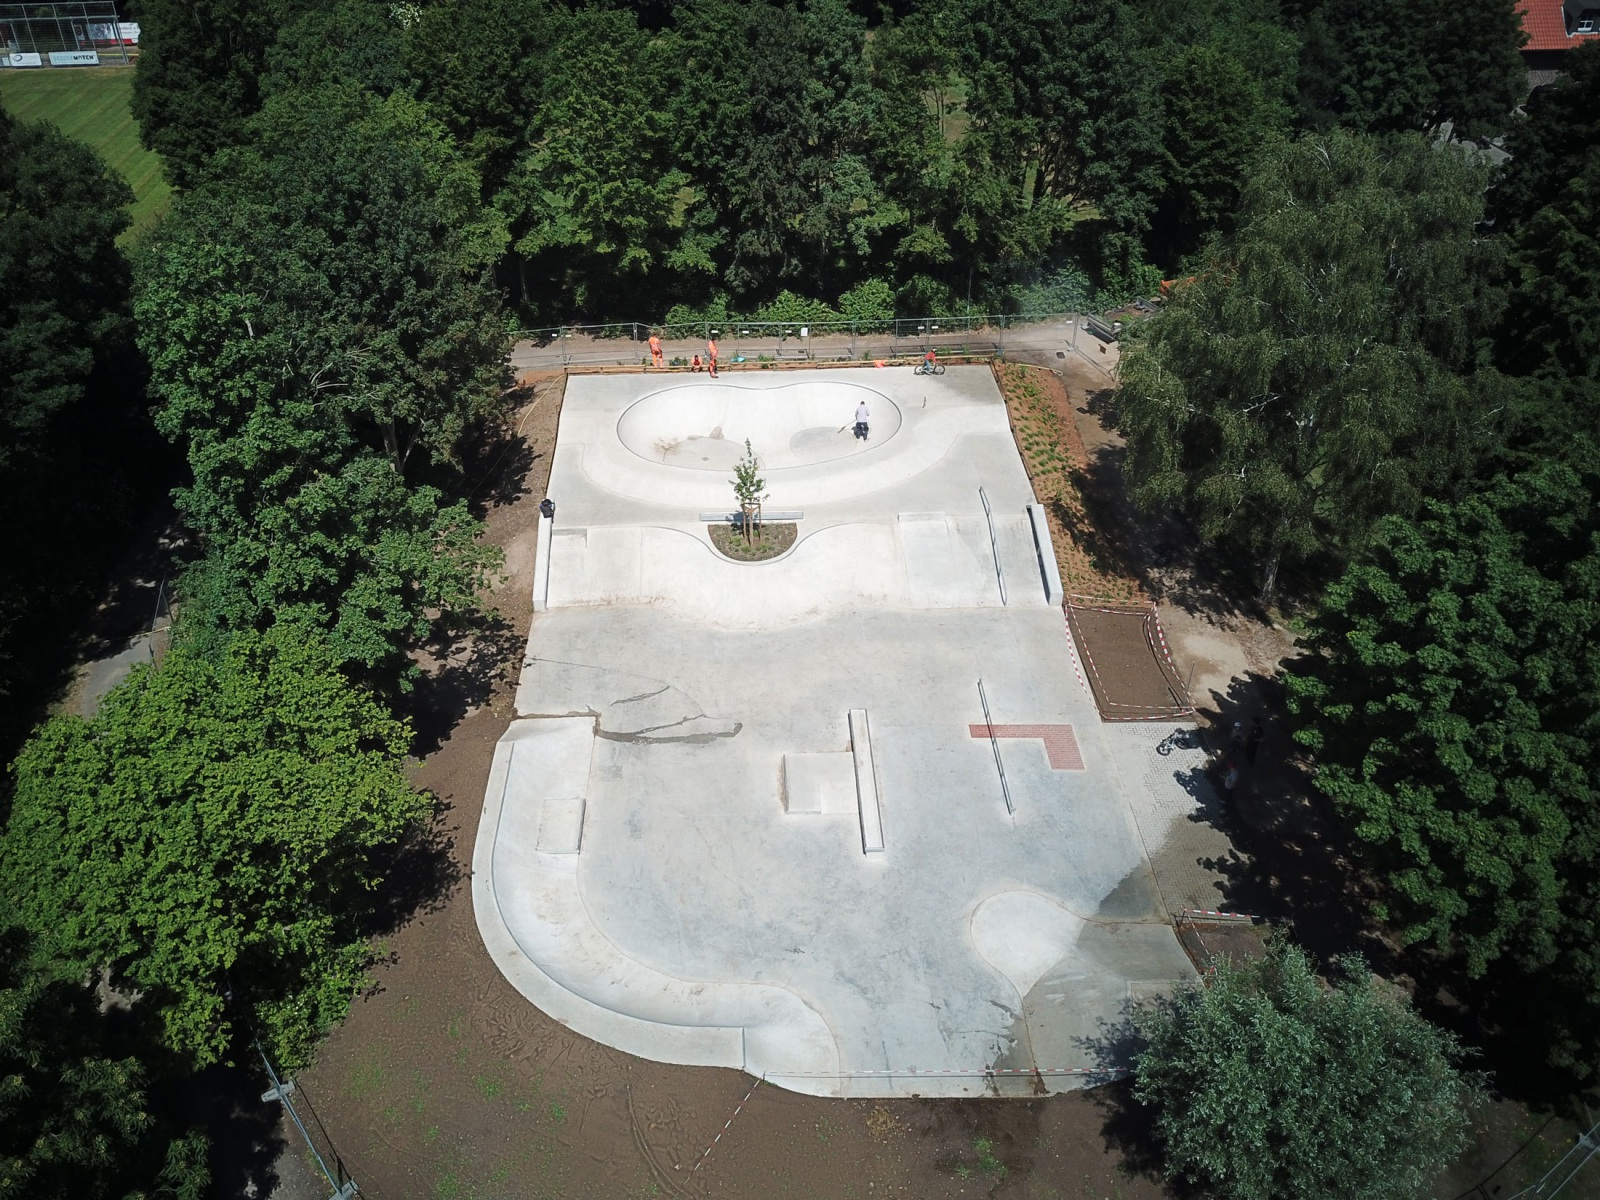 Skatepark_Sonsbeck_05.20_02